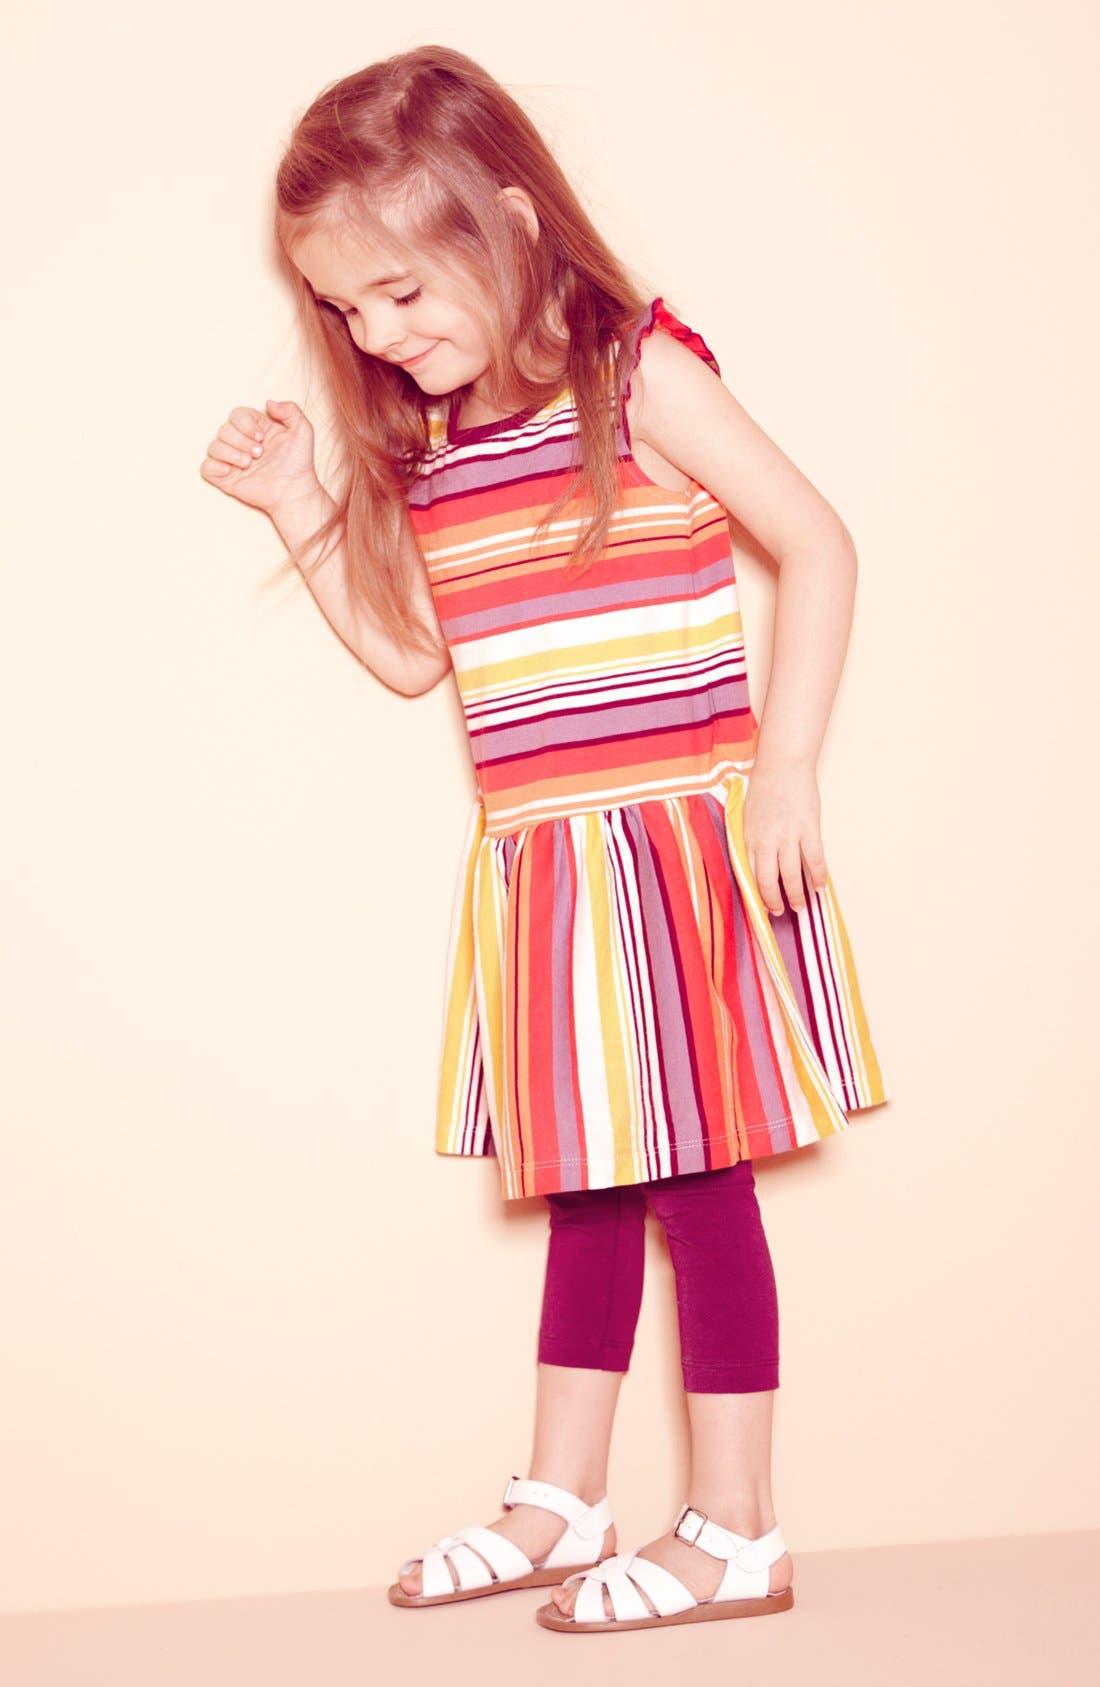 Alternate Image 1 Selected - Tea Collection Dress & Leggings & Hoy Shoe Sandal (Toddler)